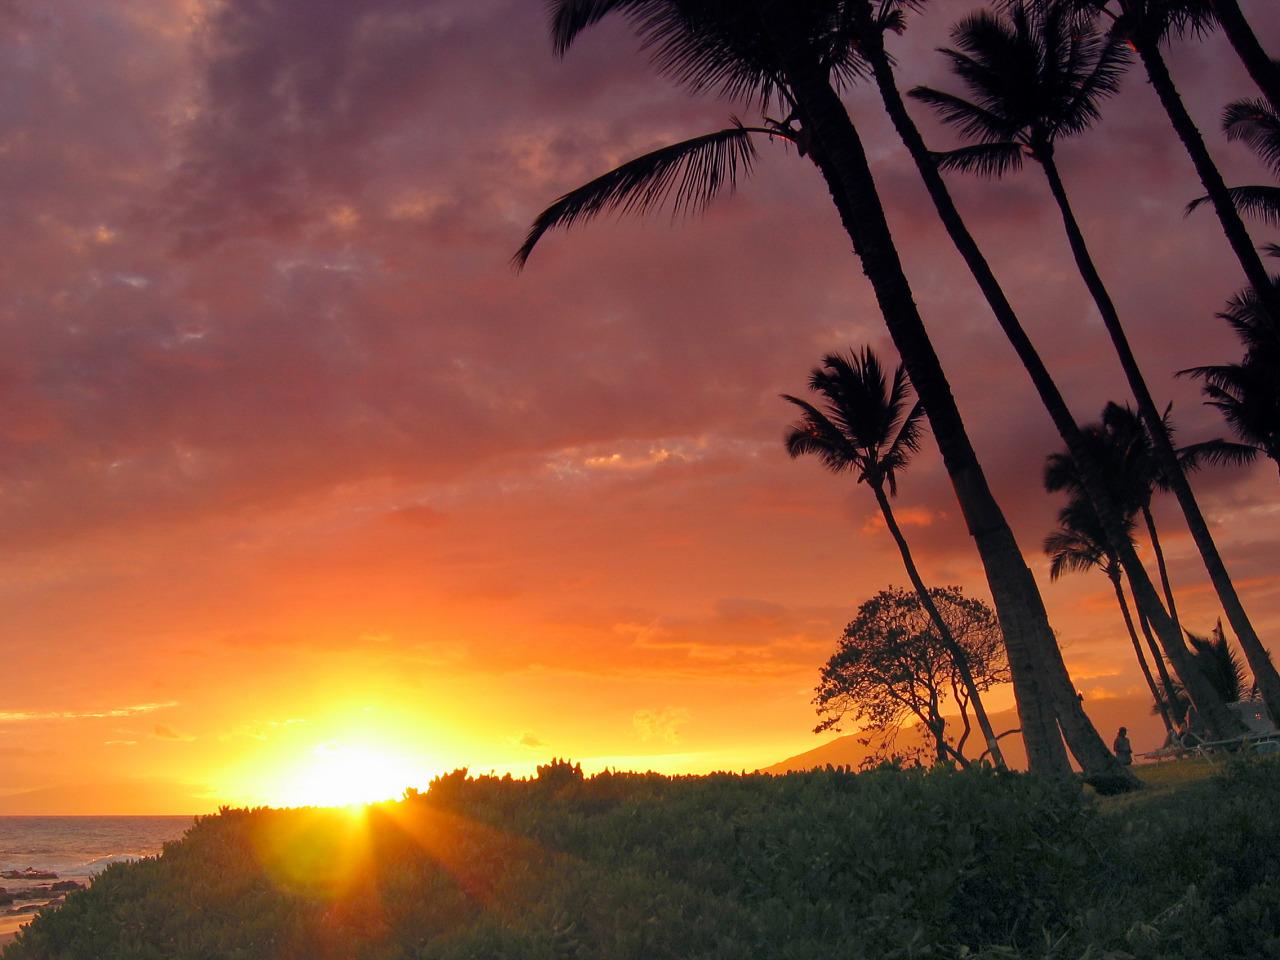 Paradise sunset on the island of Maui, Hawaii